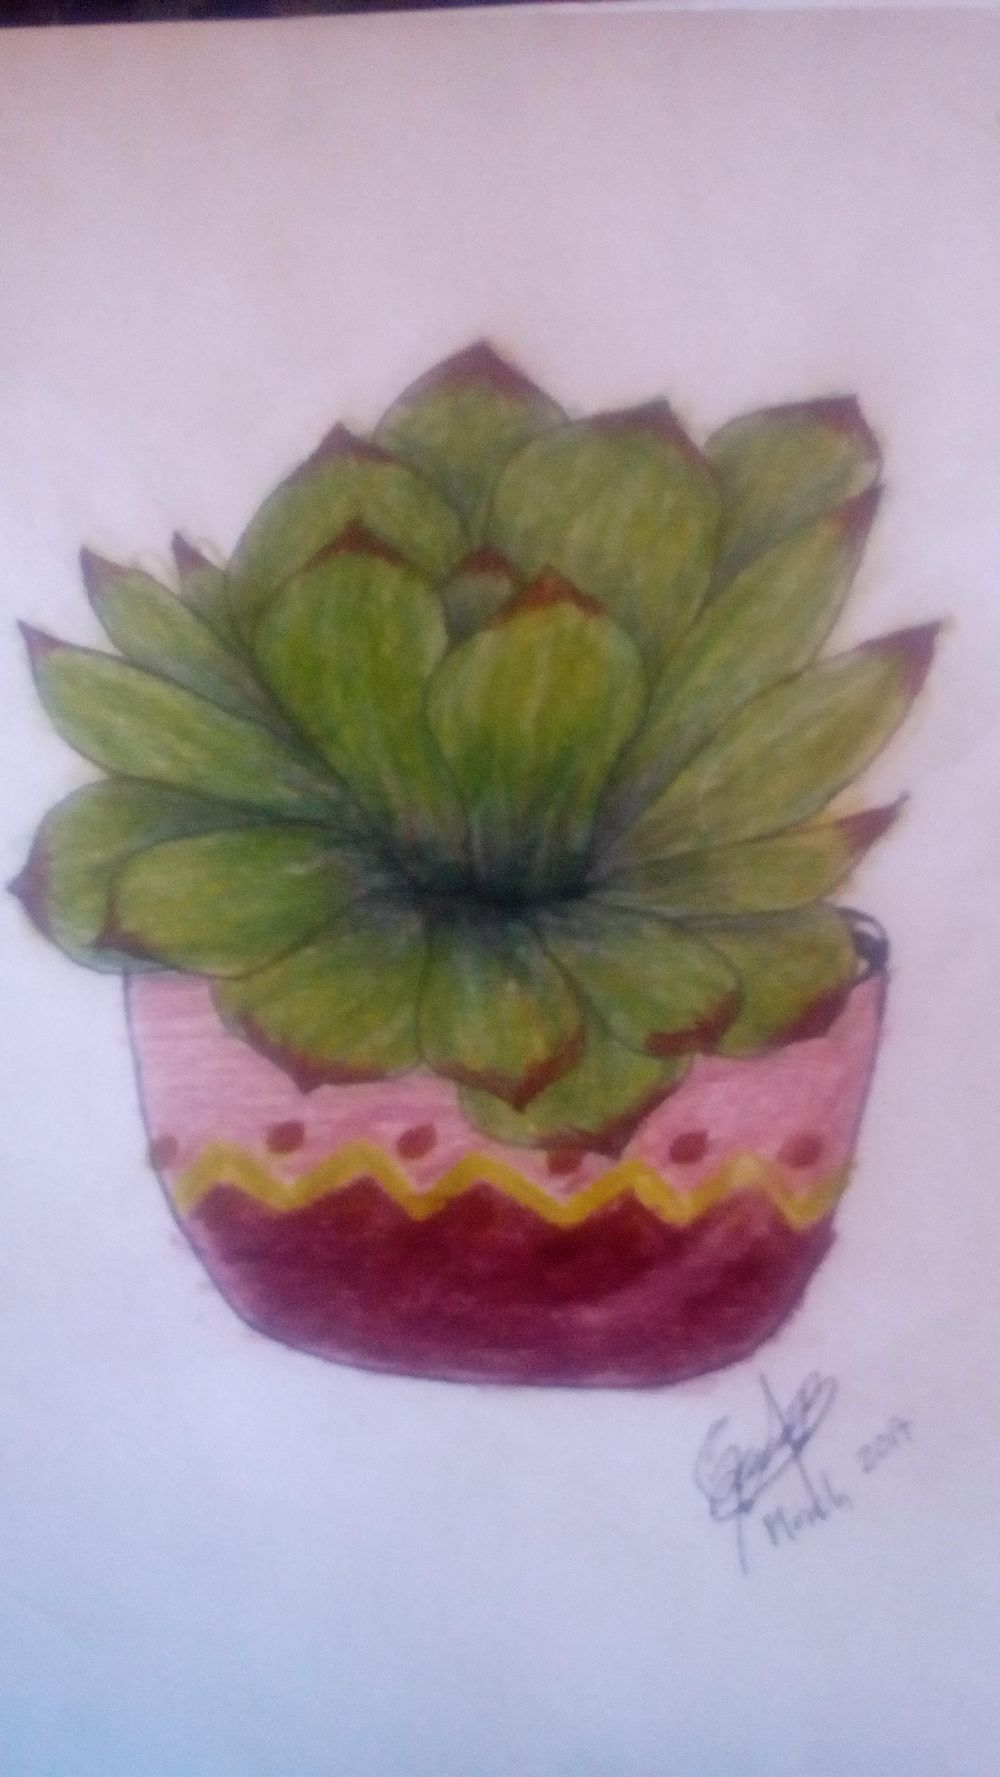 Succulent - image 4 - student project